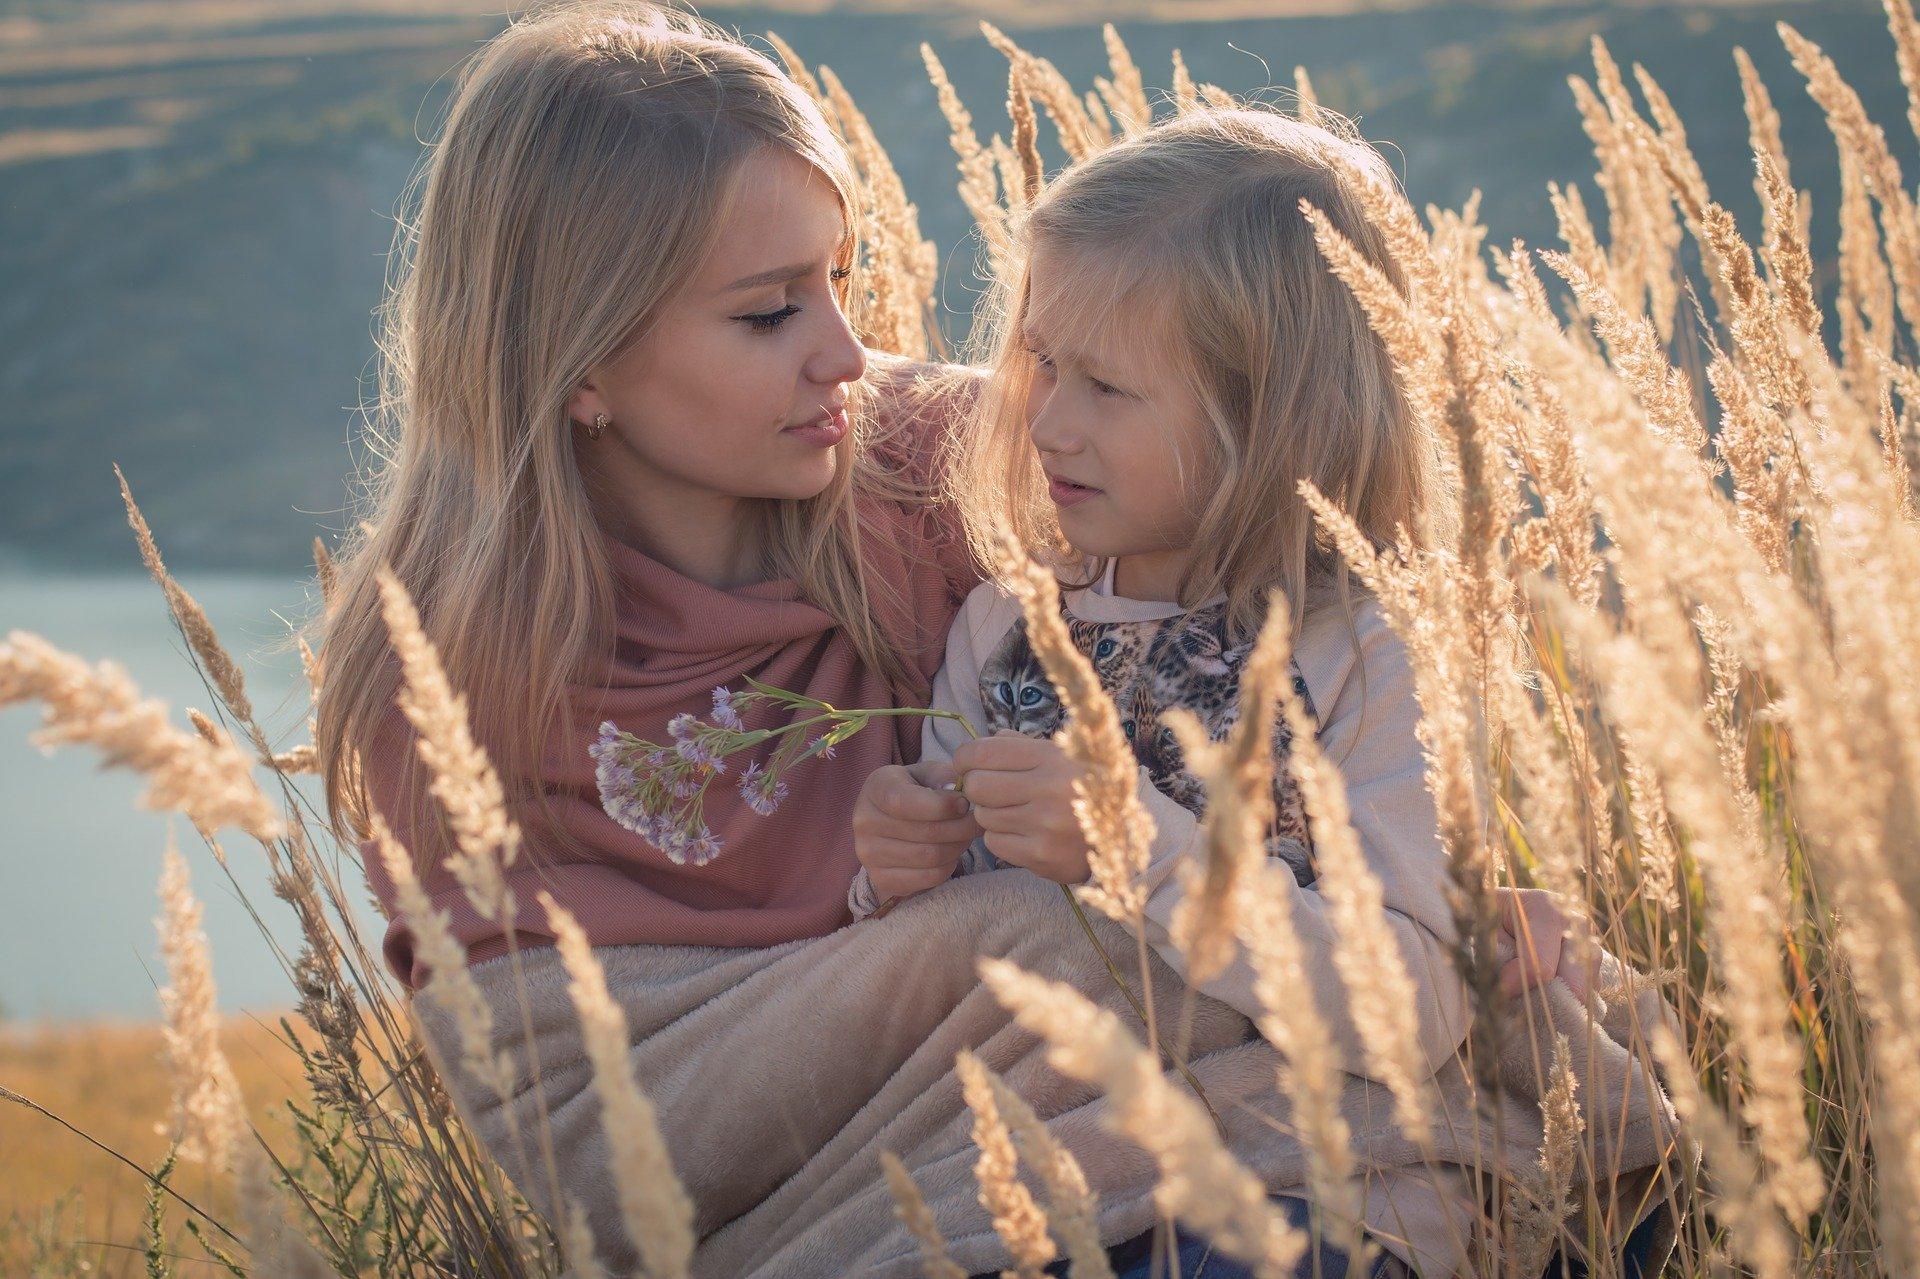 matka z córką na łące